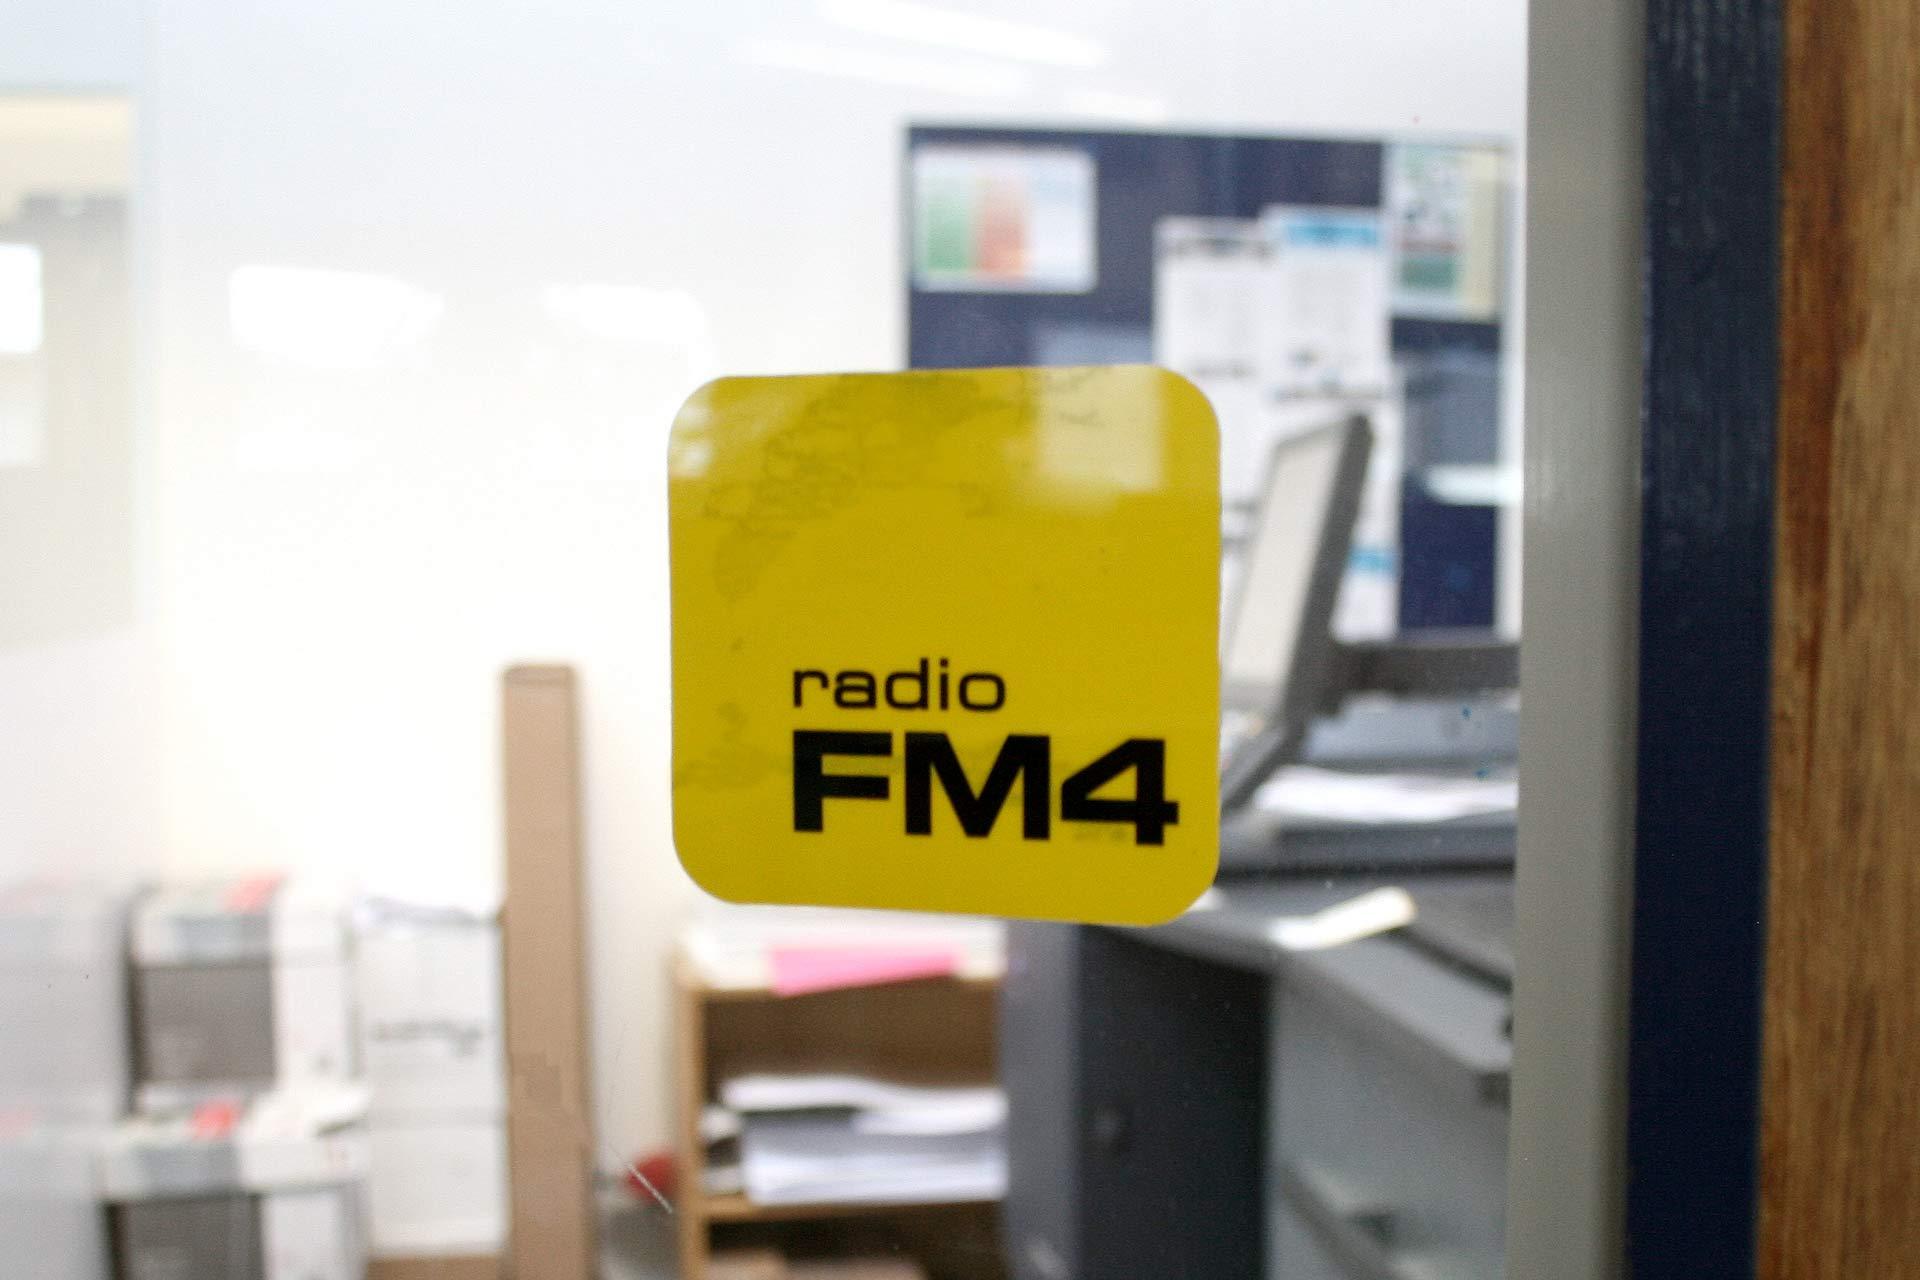 Hinterglasaufkleber FM4